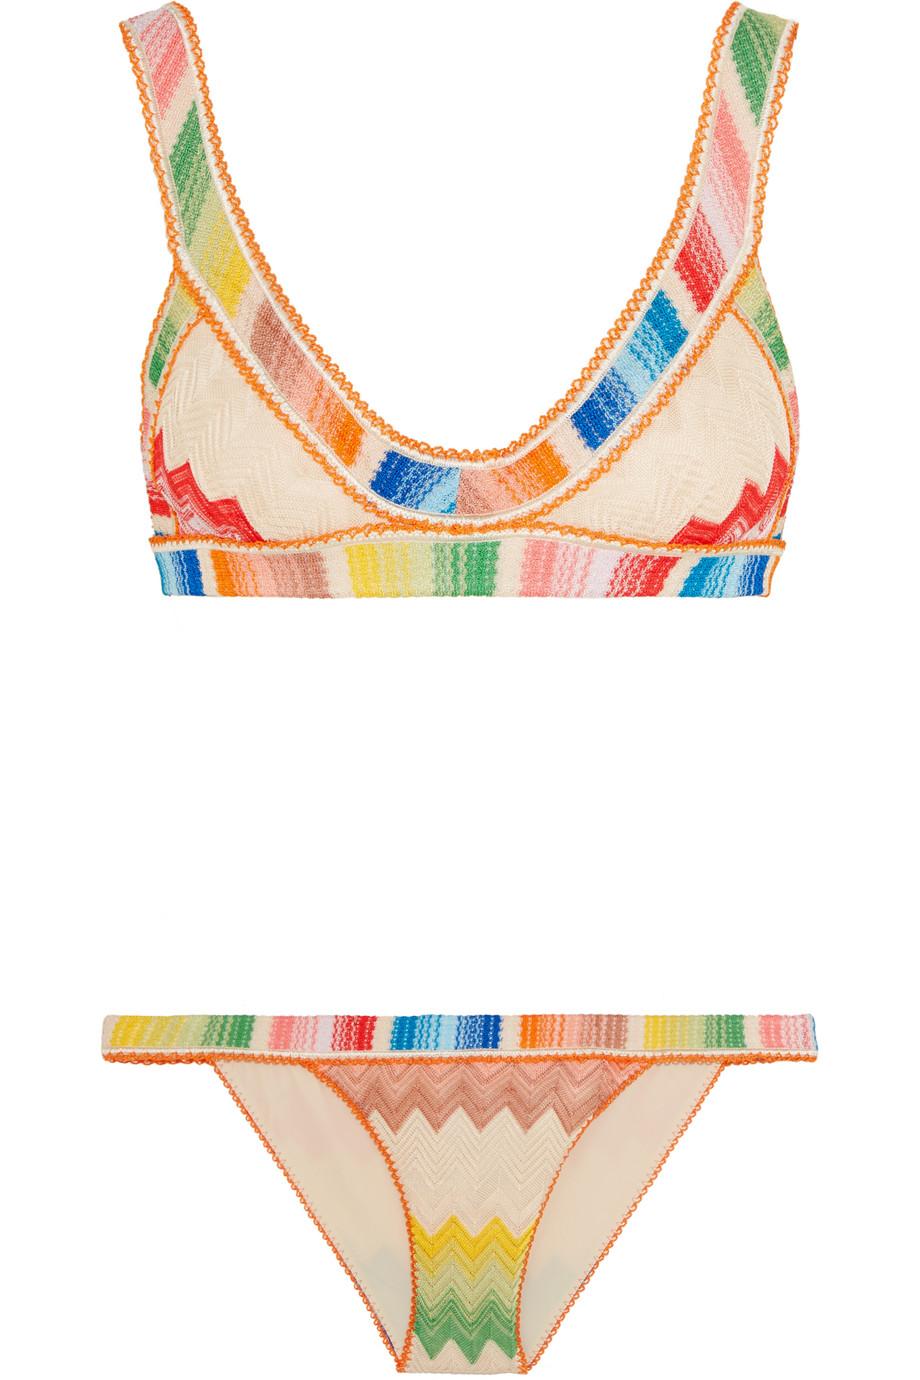 Missoni Mare Crochet-Knit Triangle Bikini, Pink/Orange, Women's, Size: 42